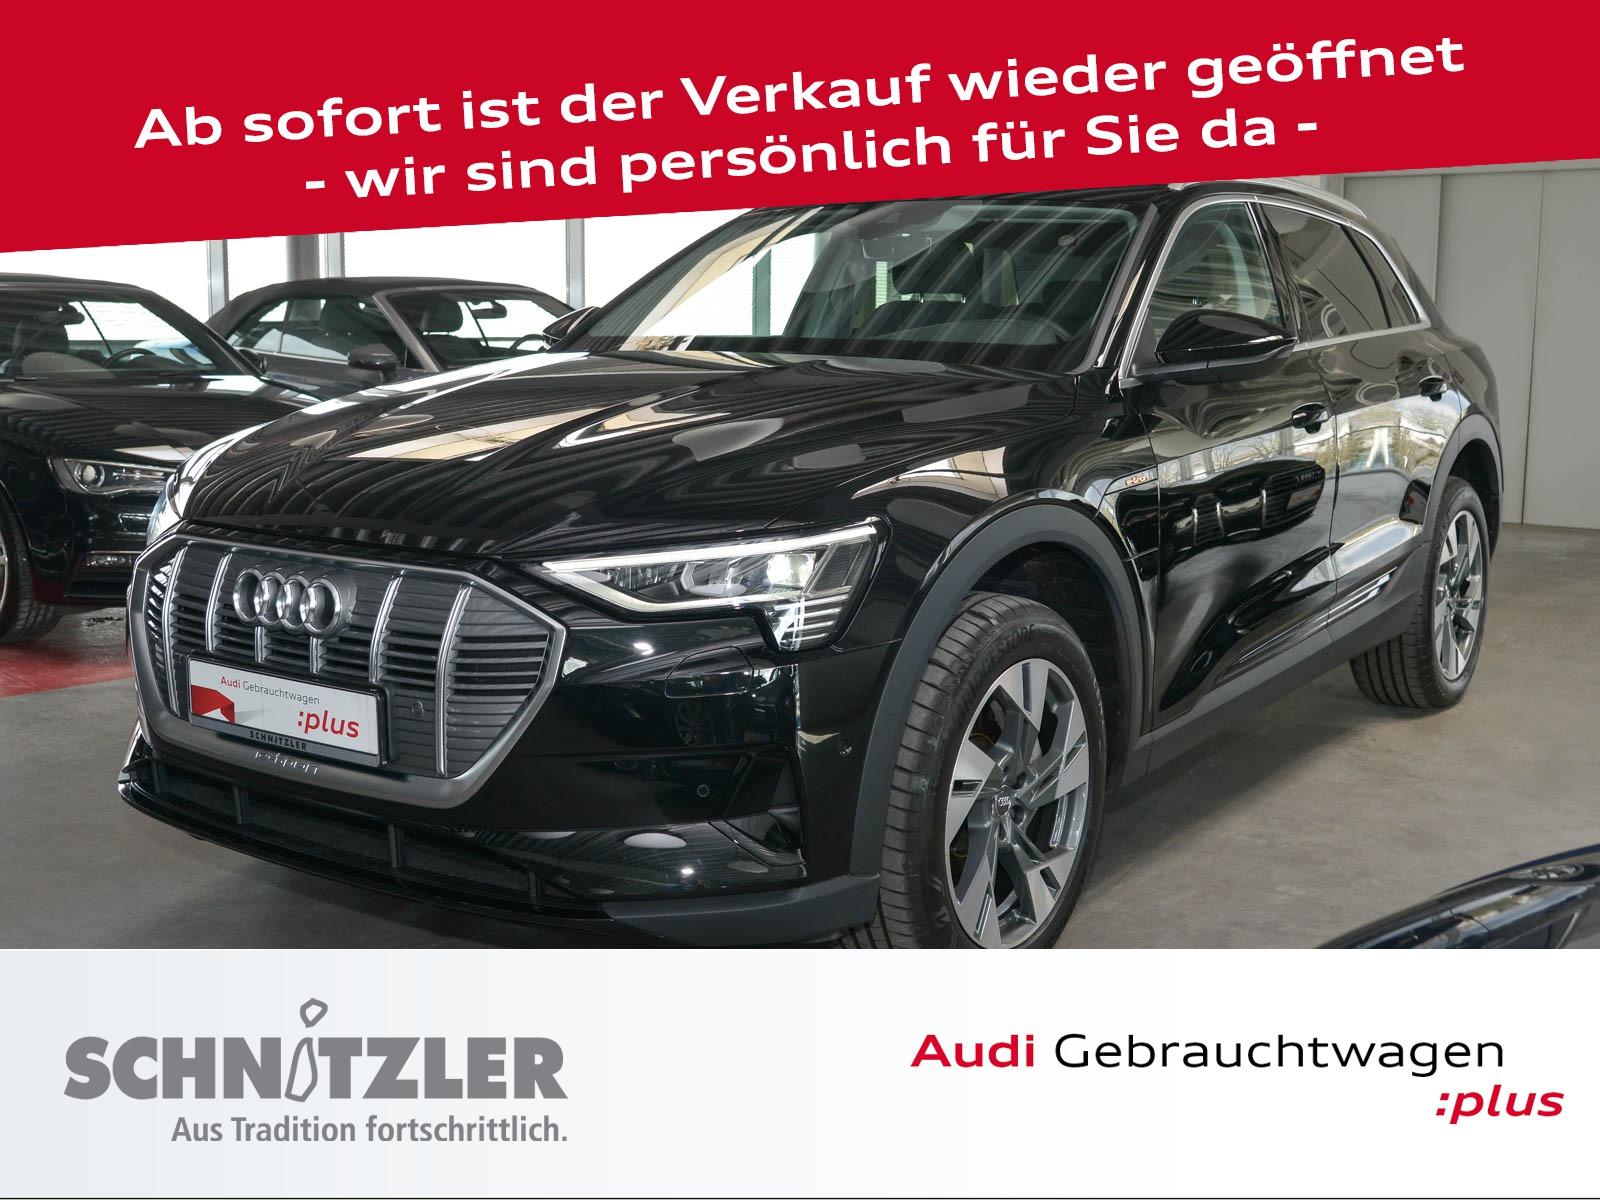 Audi e-tron 50 quattro virtual cockpit plus/Navi plus/+++, Jahr 2020, Elektro